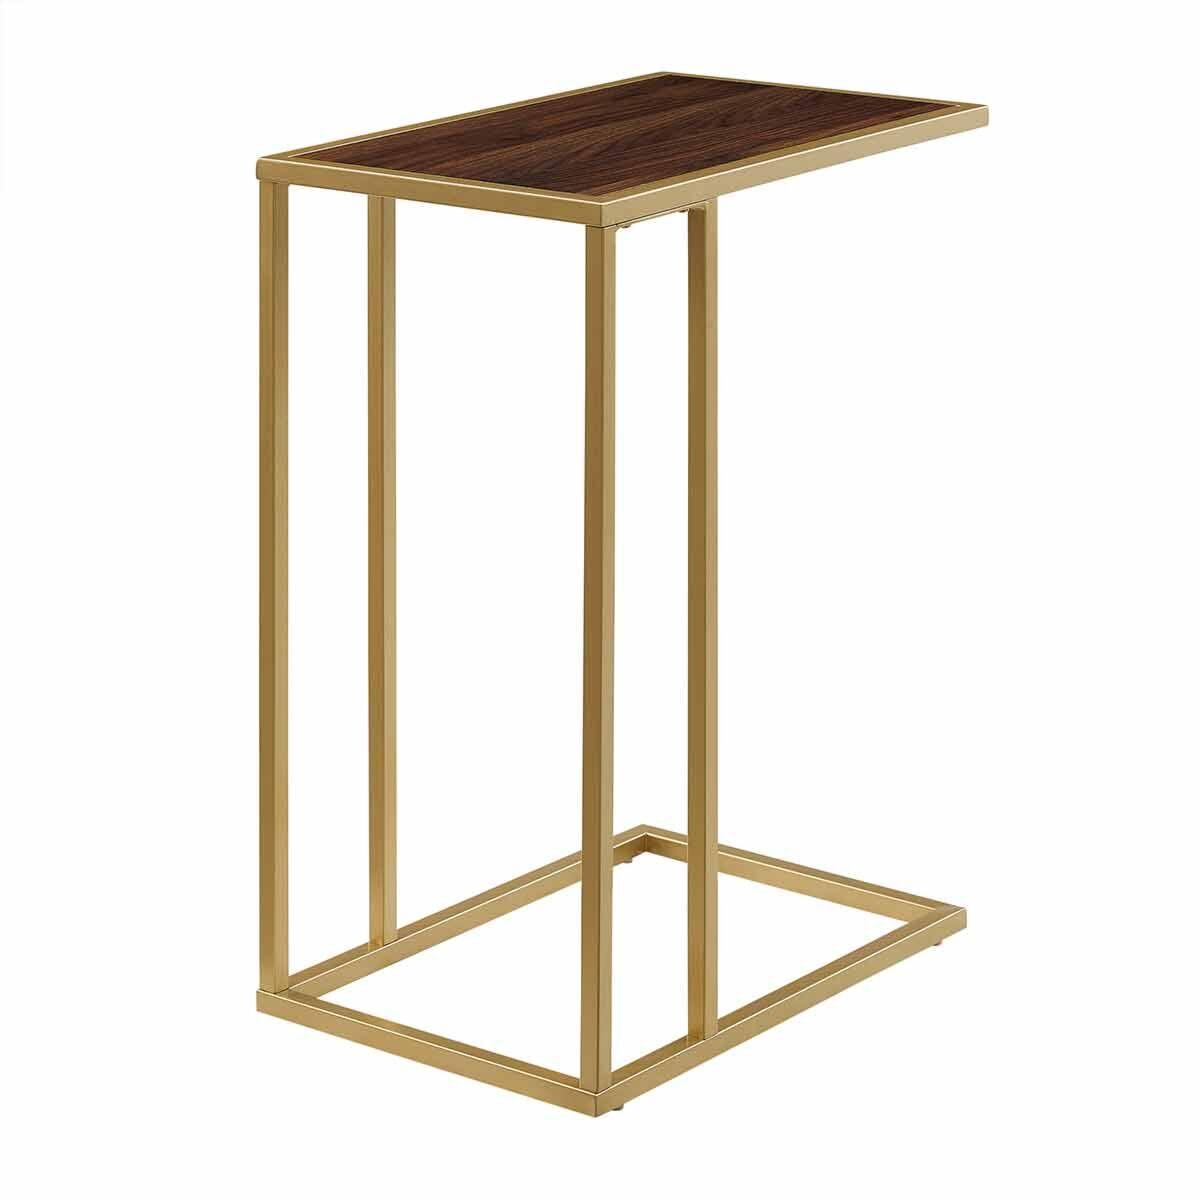 Alzira Modern End Table